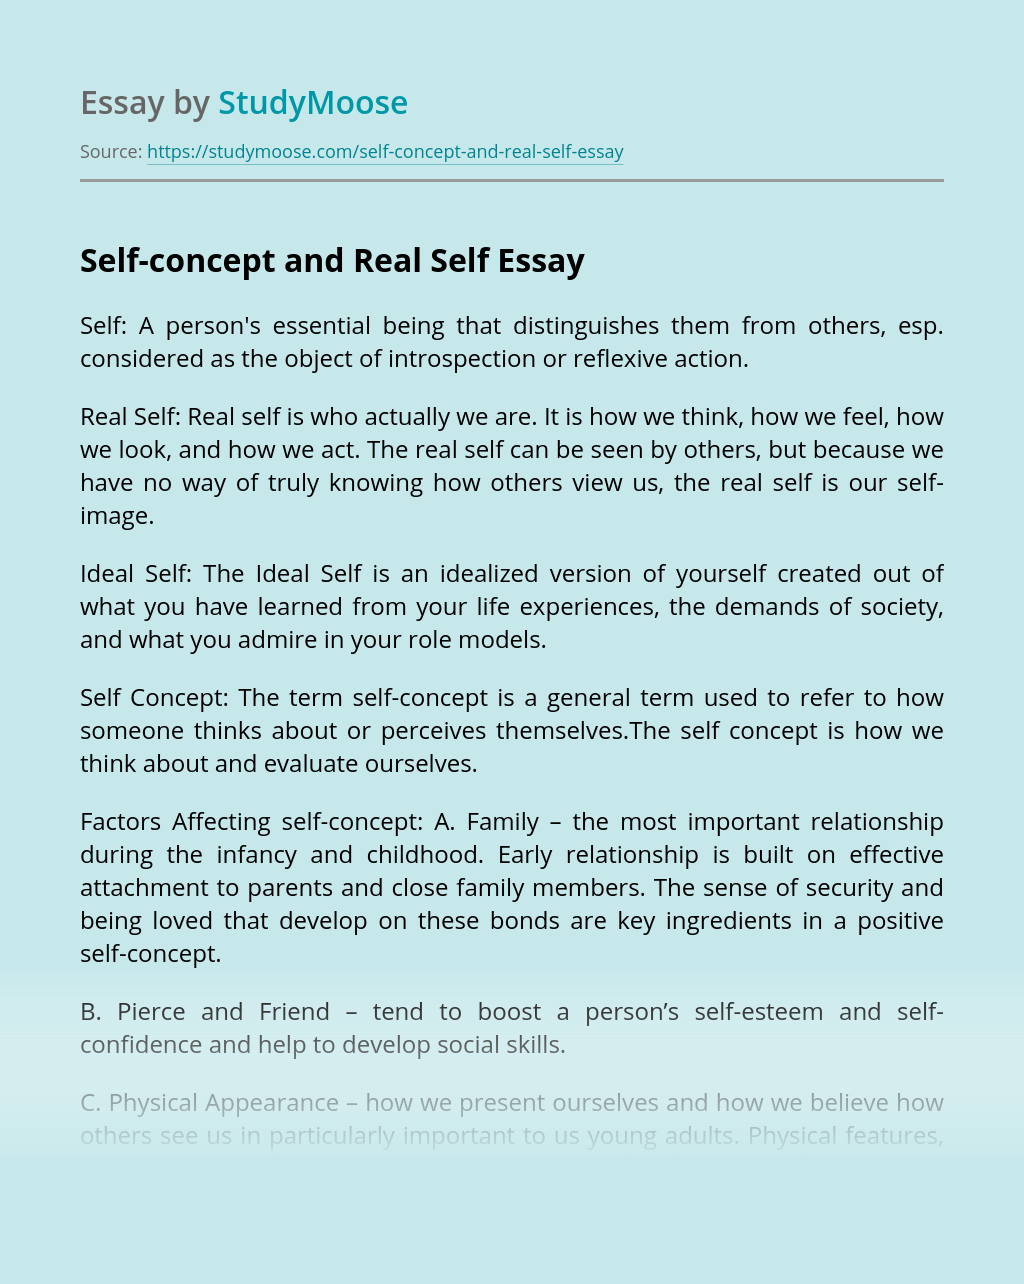 Self-concept and Real Self